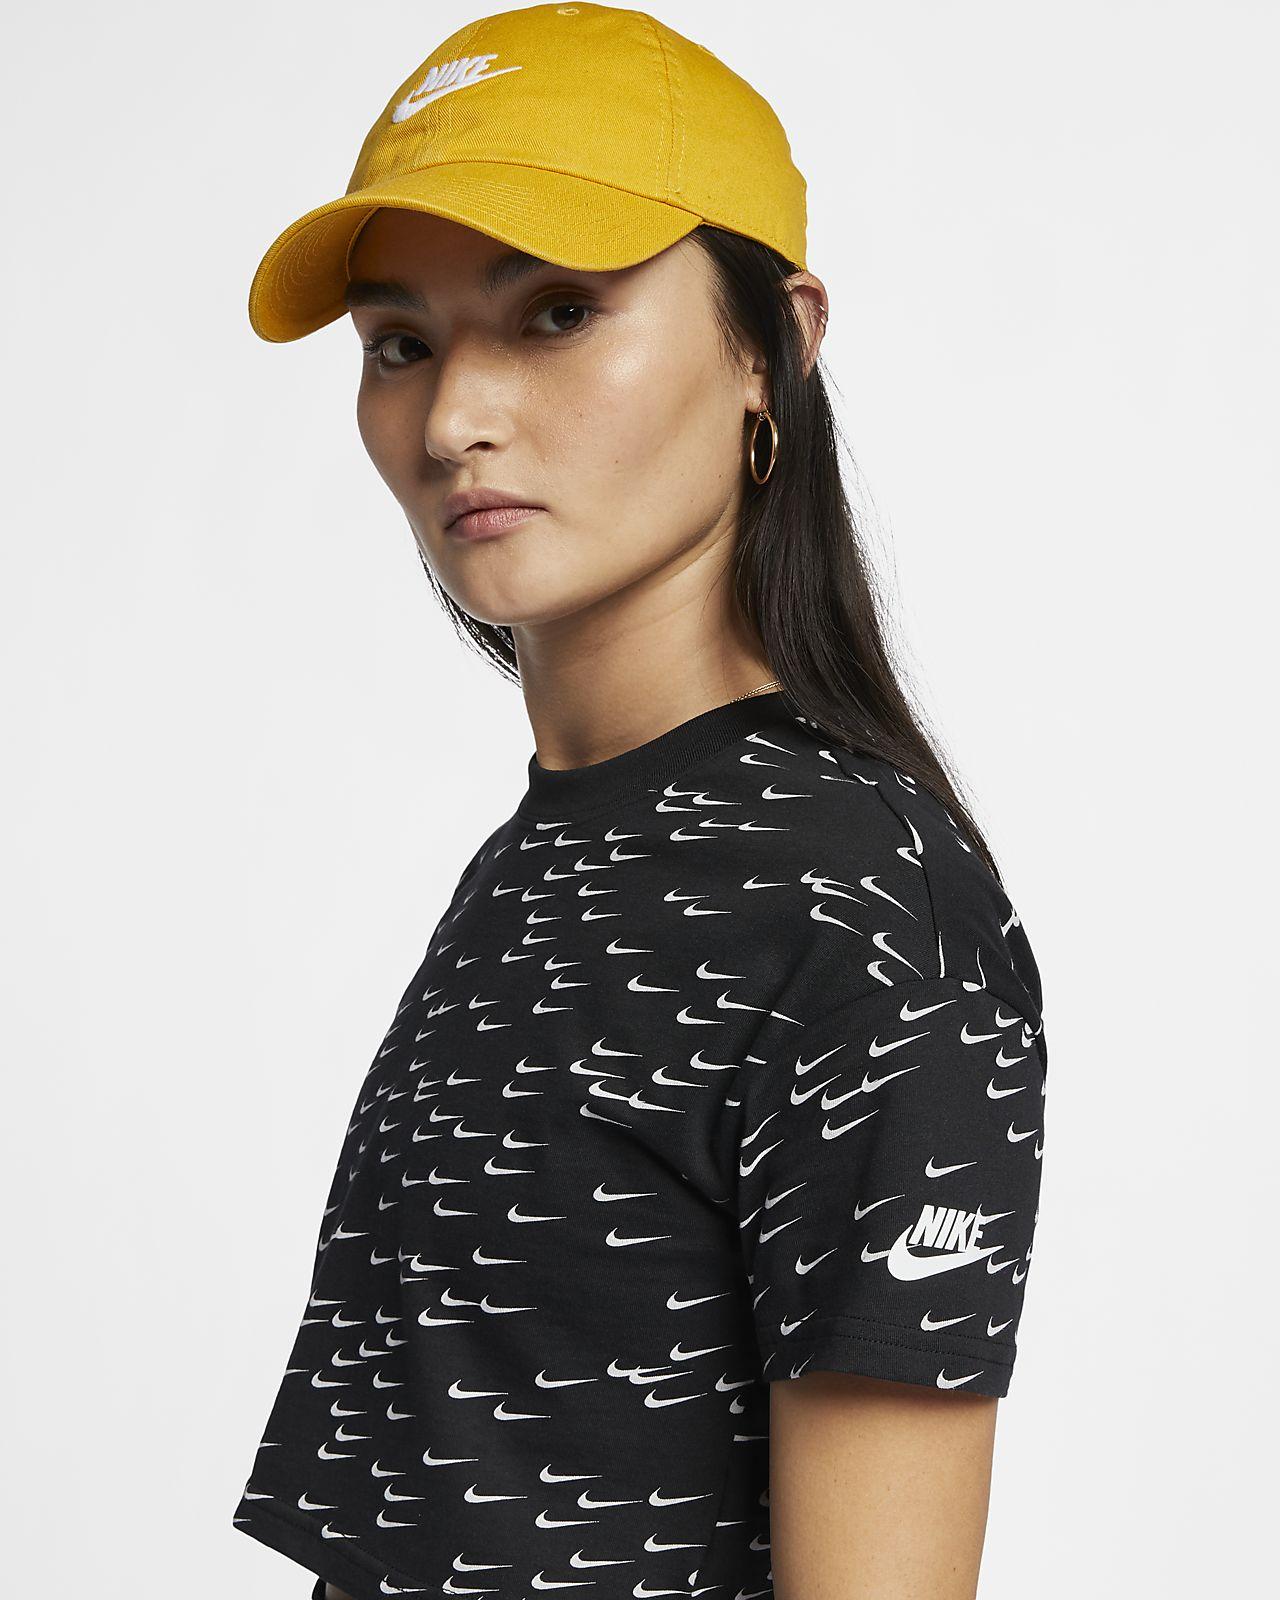 a2b39e9575e8 Haut court à manches courtes Nike Sportswear Essential pour Femme ...